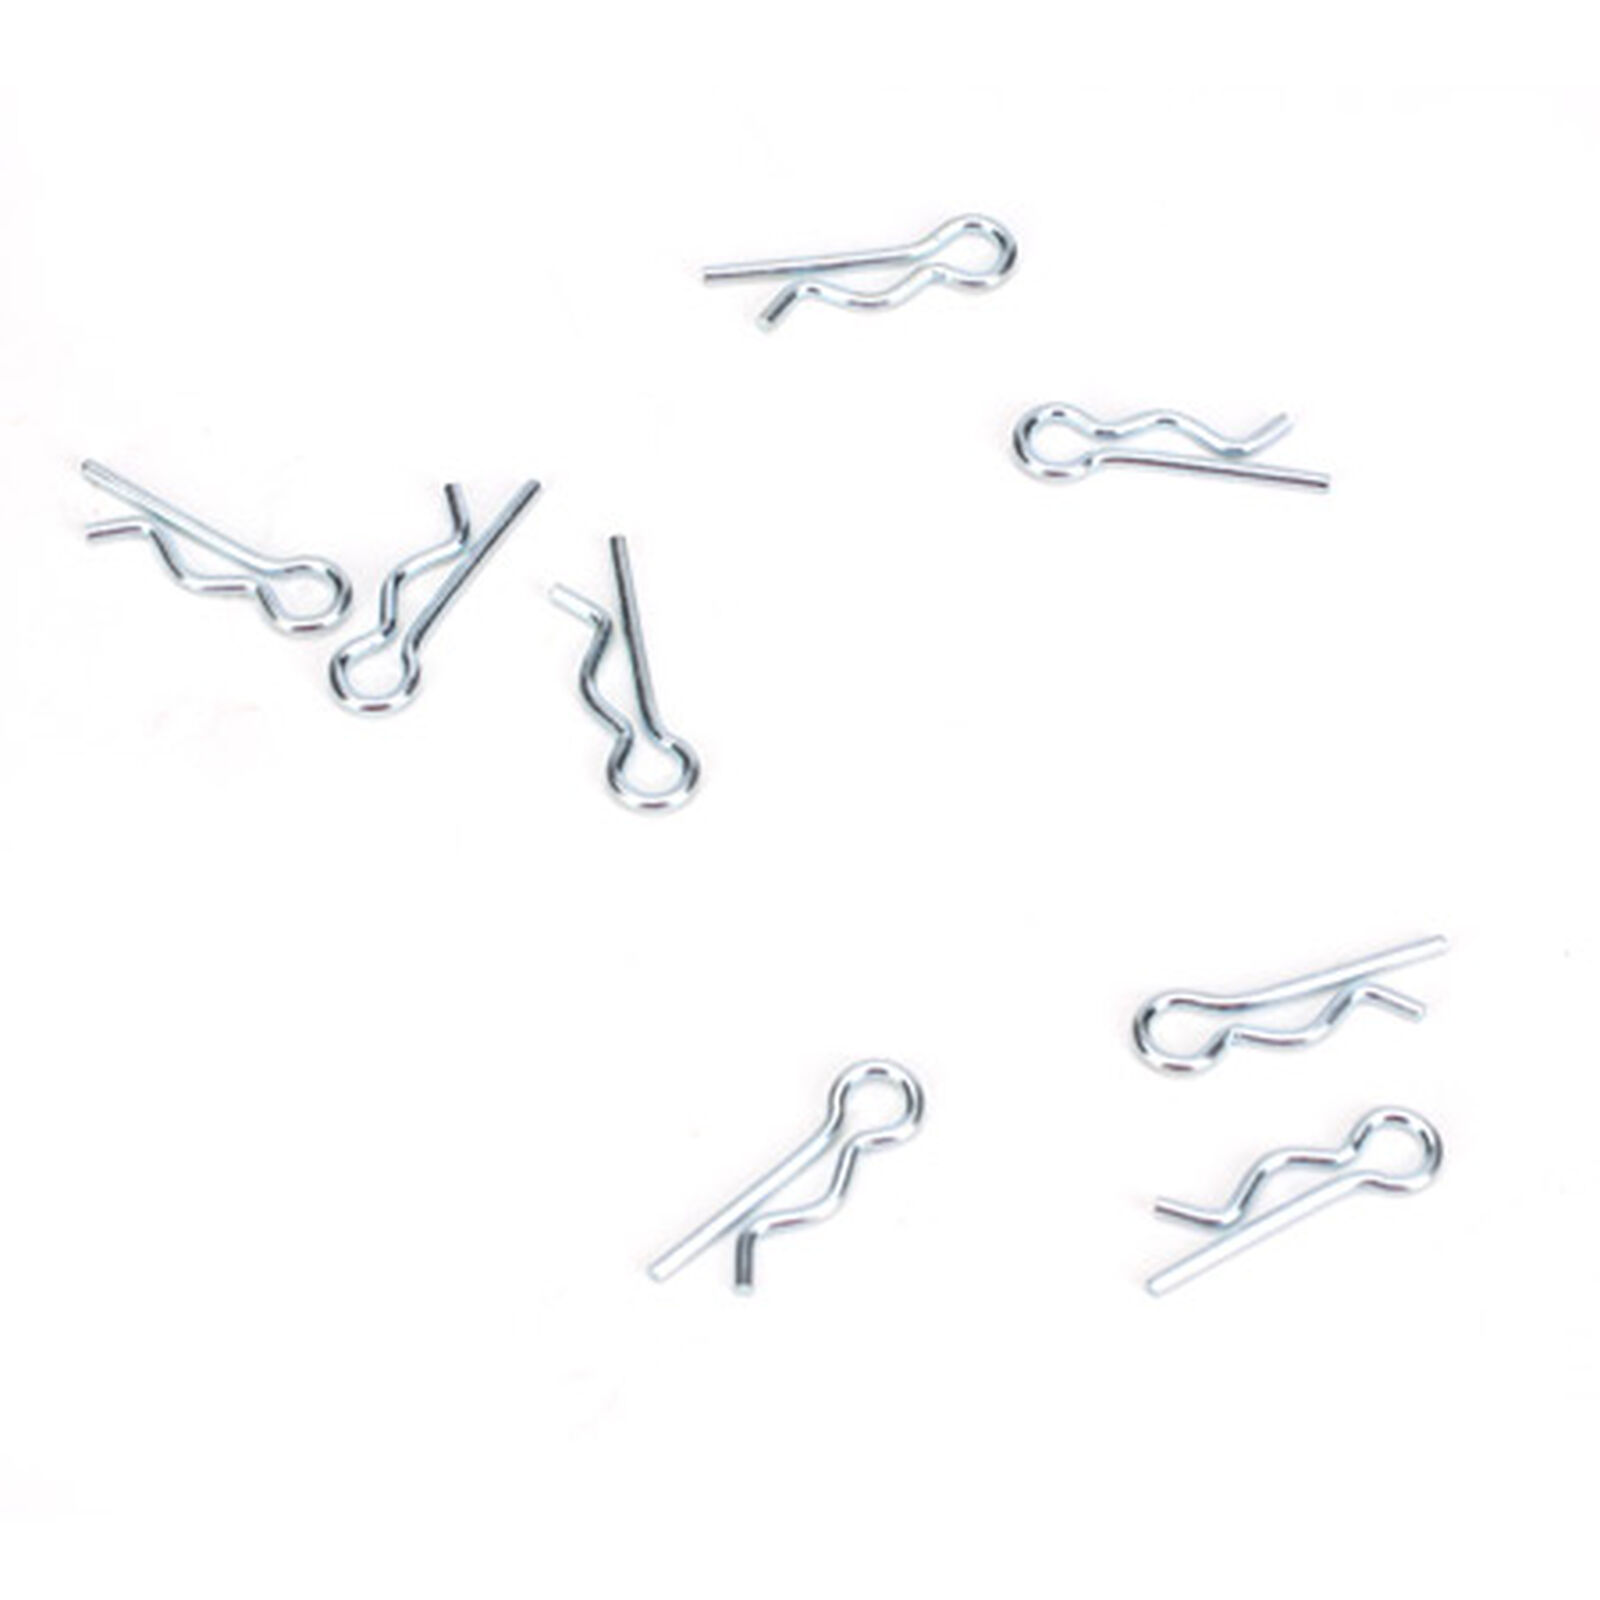 Body Clips (8): Circuit, Ruckus, Boost, Barrage